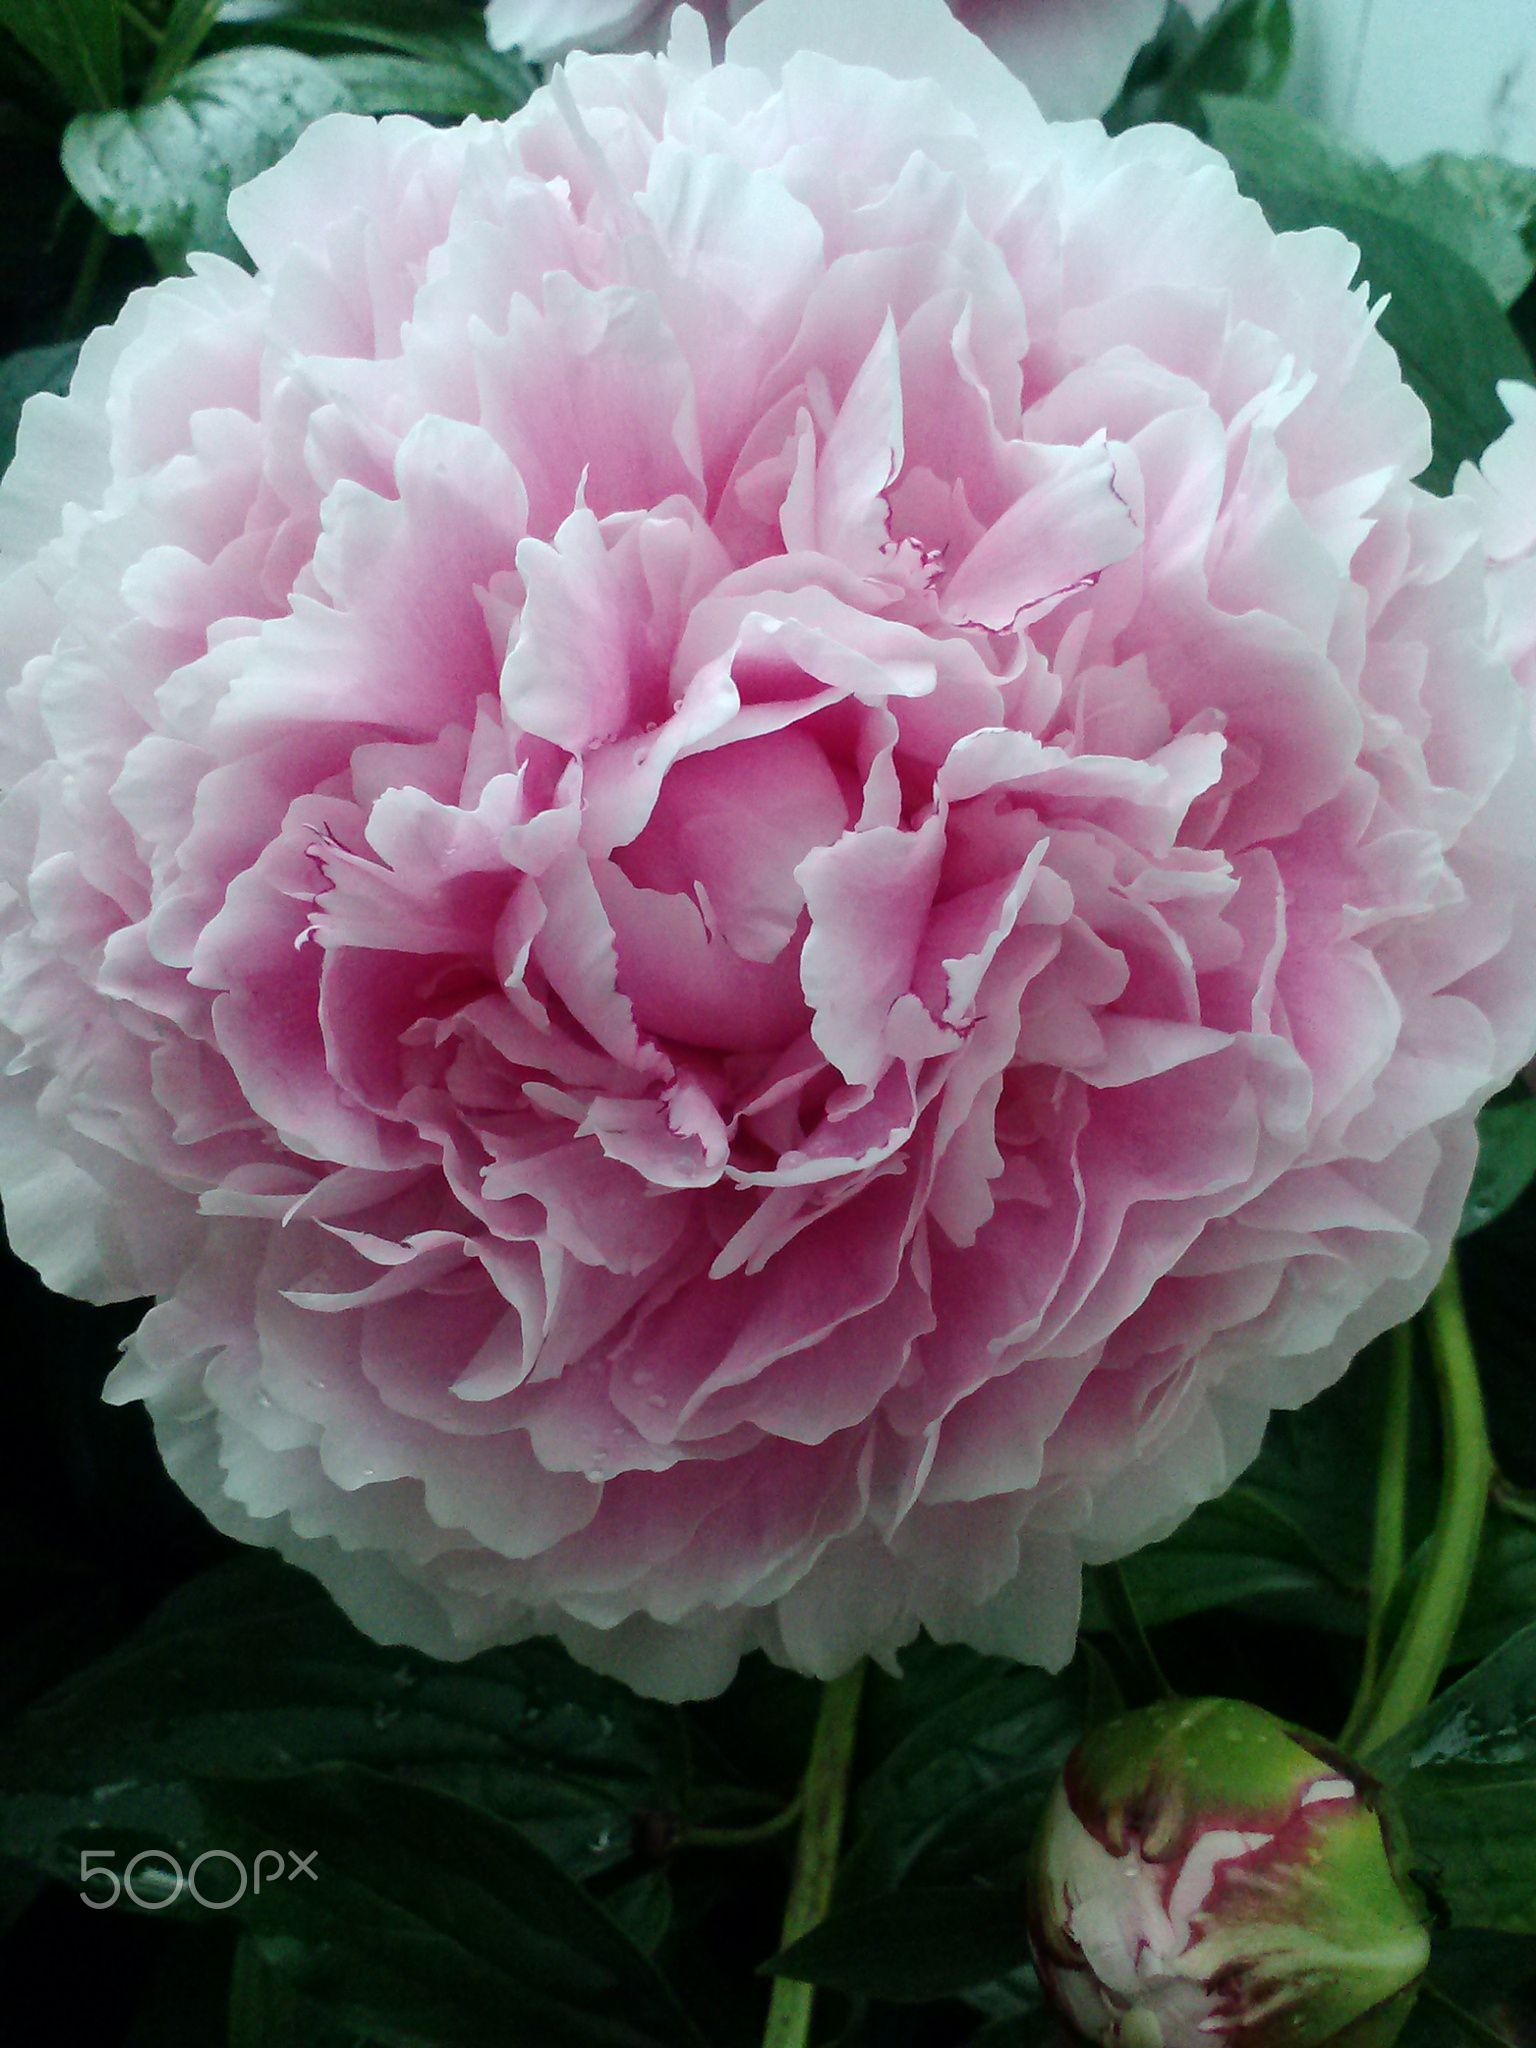 Peony Opened - A random flower photo...